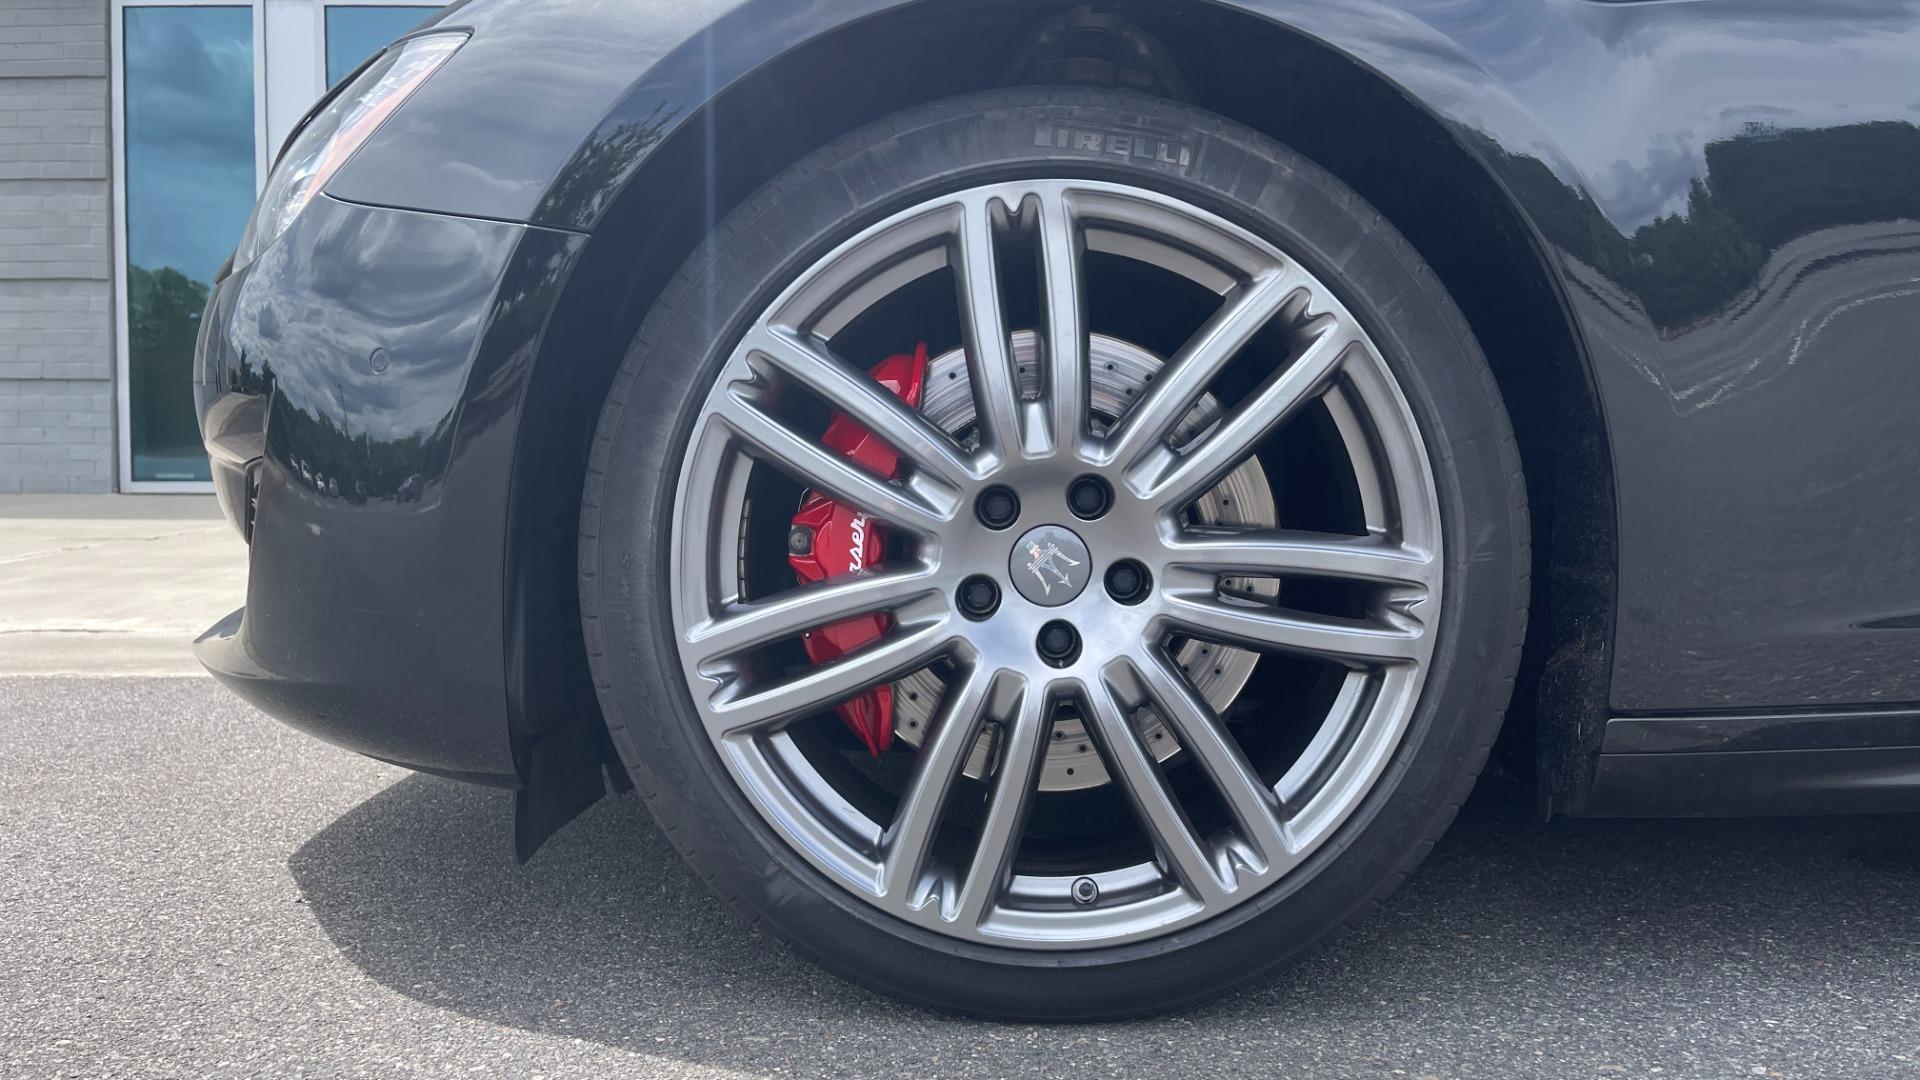 Used 2018 Maserati GHIBLI S Q4 SEDAN / AWD / 3.0L V6 / SUNROOF / NAV / REARVIEW for sale $51,995 at Formula Imports in Charlotte NC 28227 66